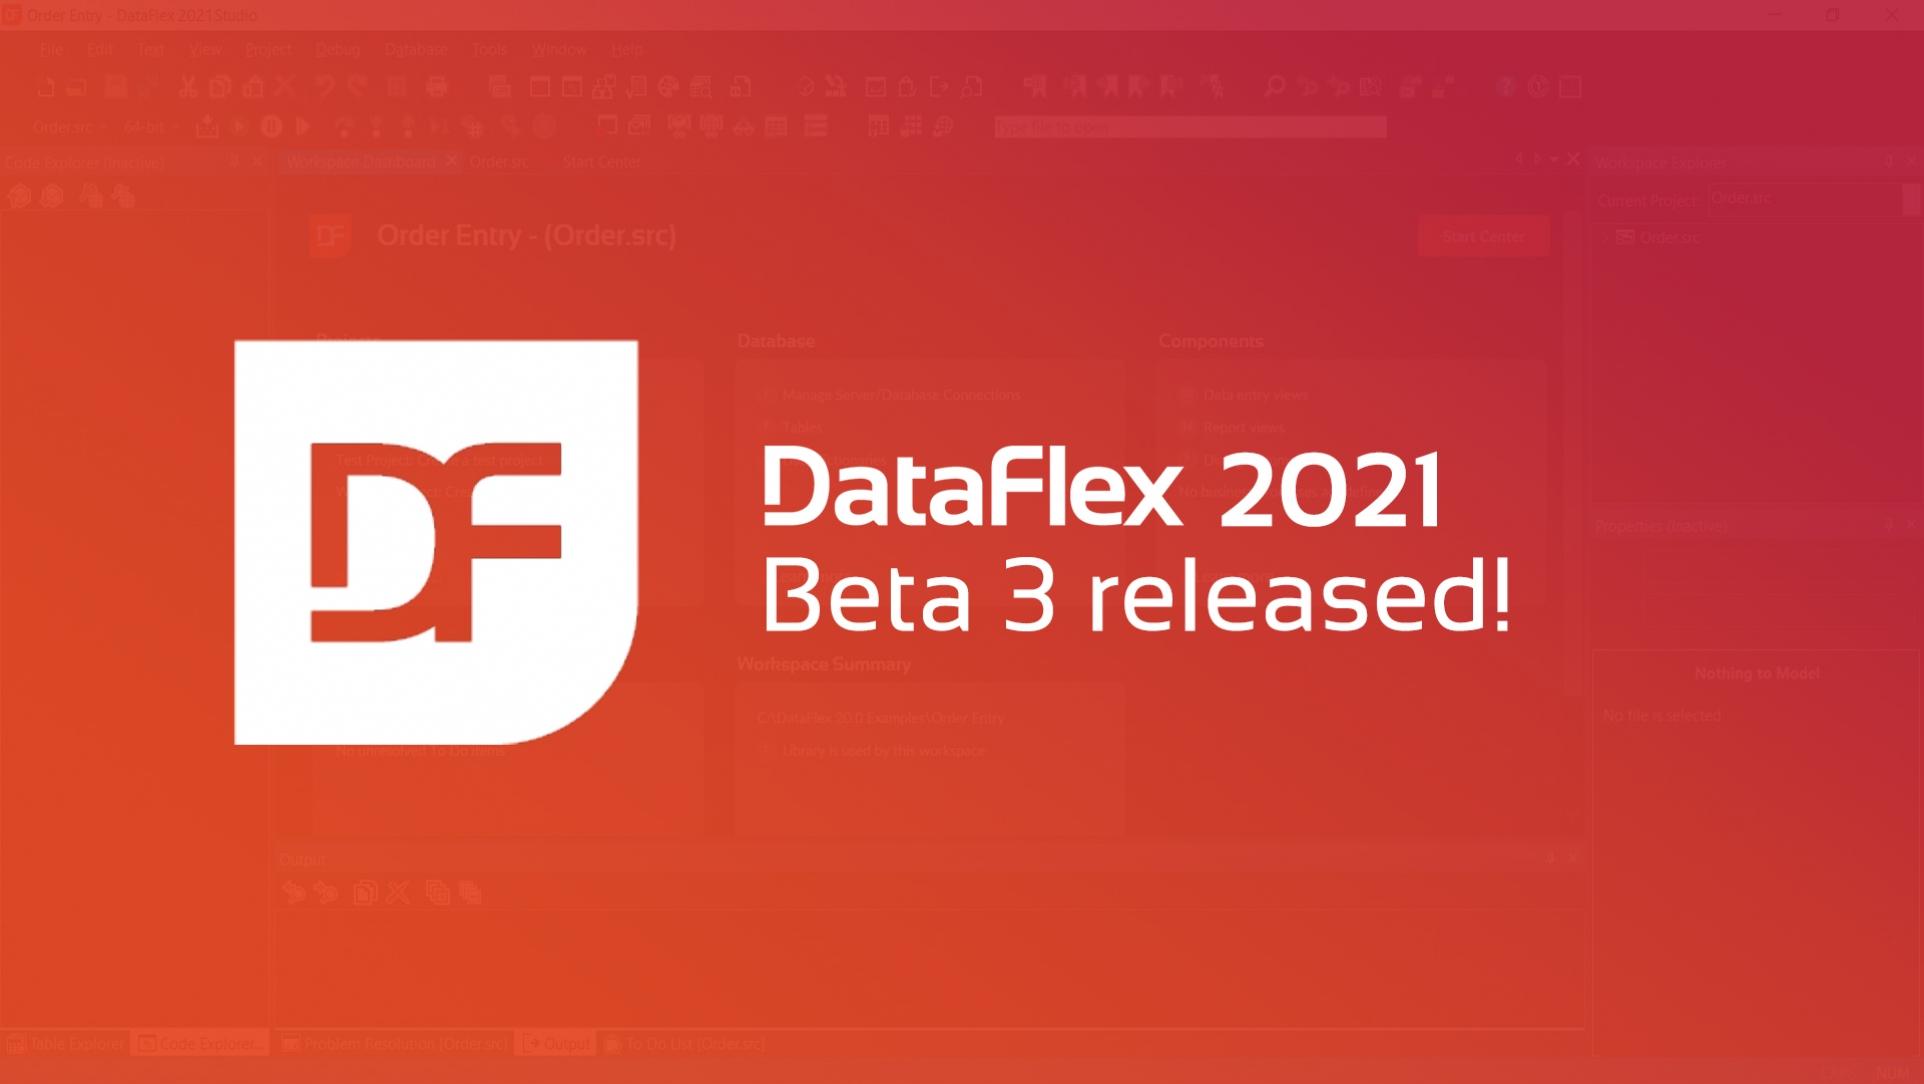 2020-12-08 DataFlex 2021 OG image Beta 3